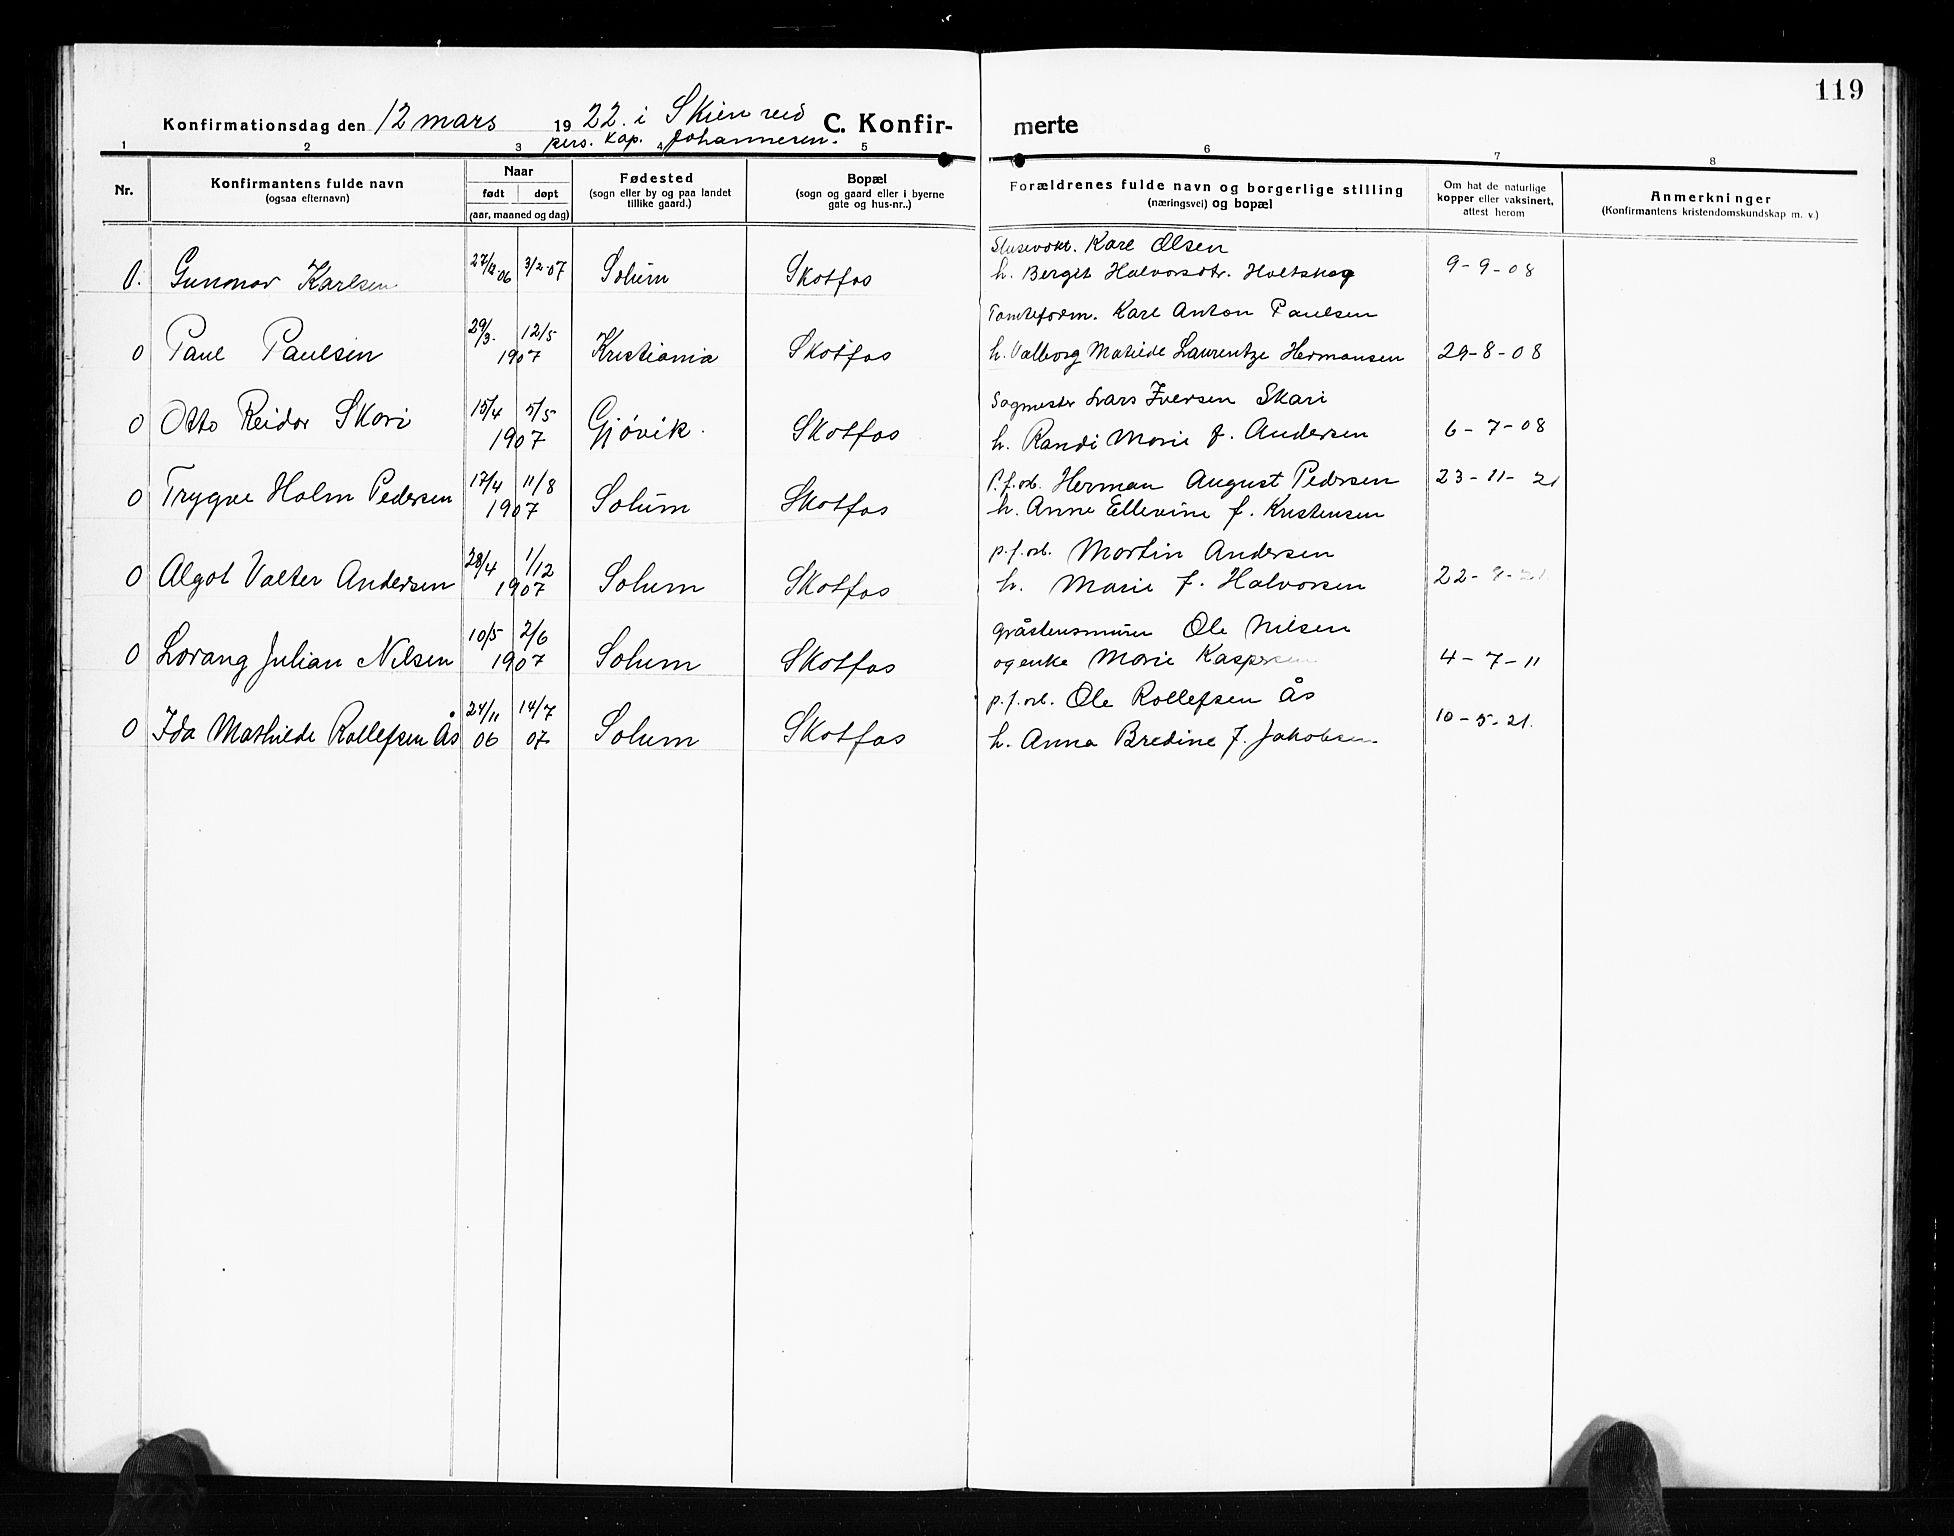 SAKO, Solum kirkebøker, G/Gb/L0006: Klokkerbok nr. II 6, 1915-1927, s. 119